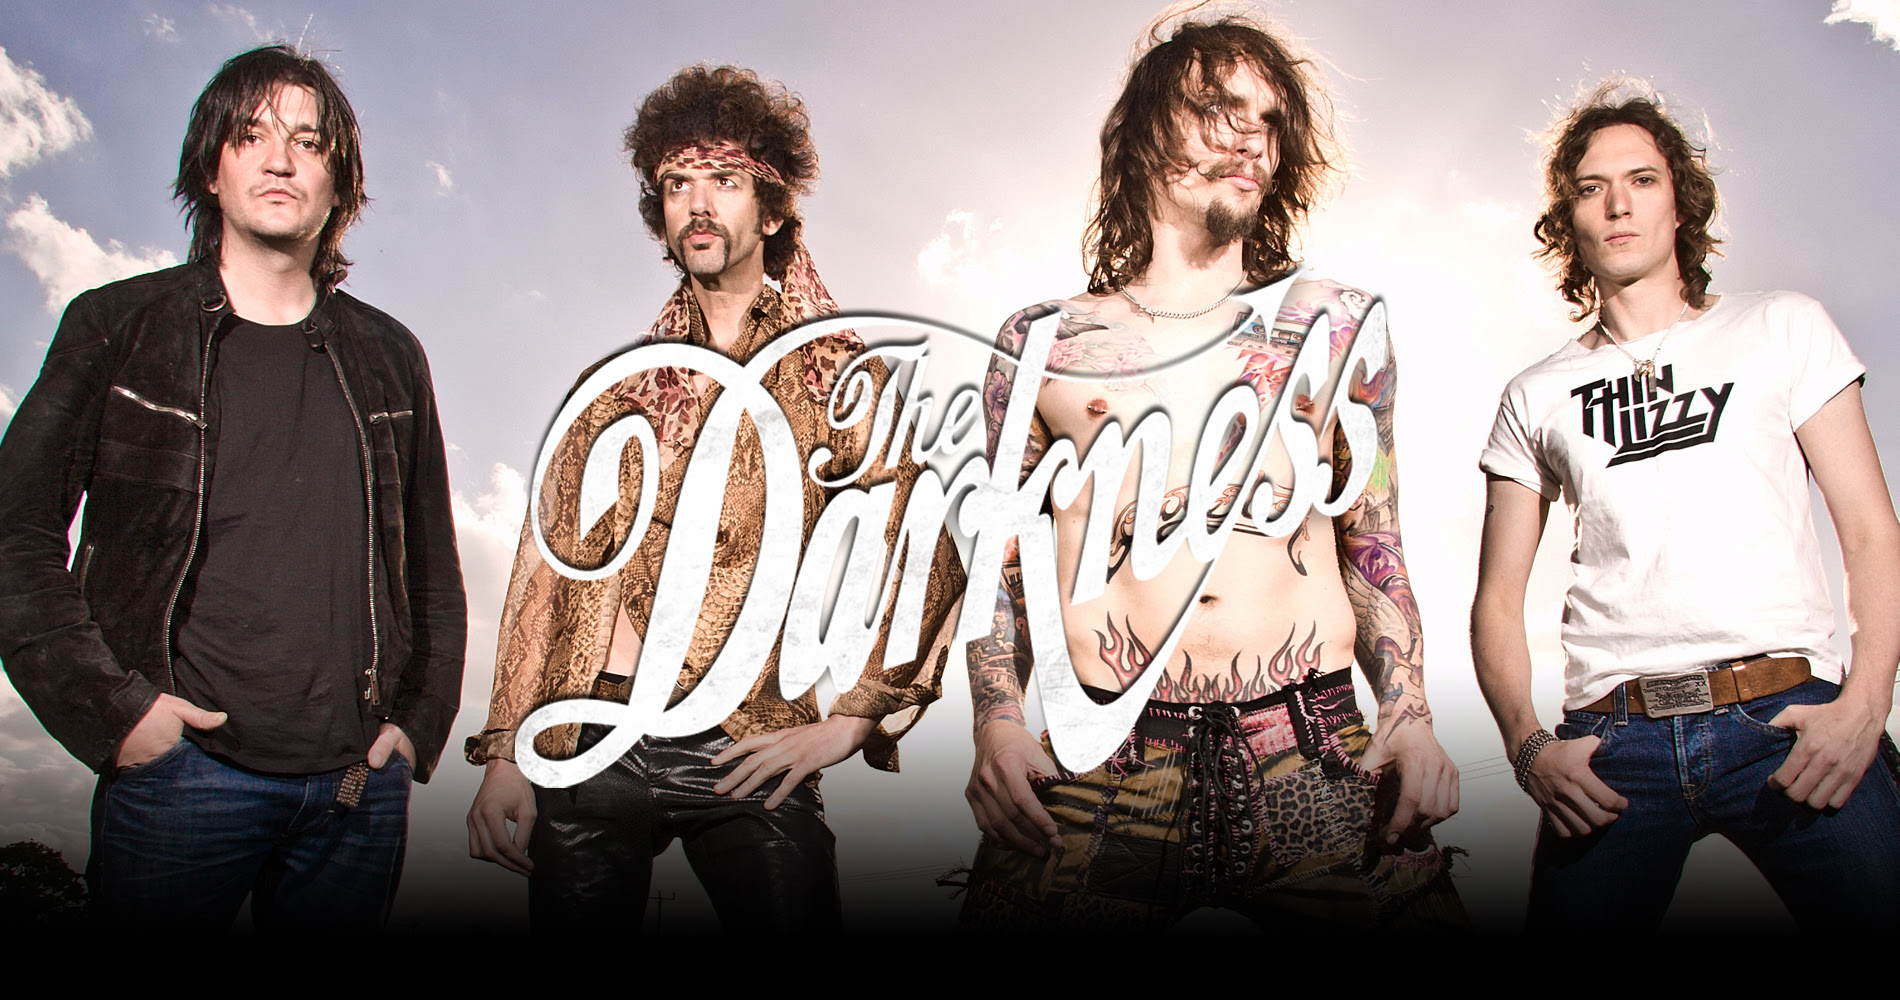 Lirik Lagu Lirik The Darkness Love Is Only Feeling